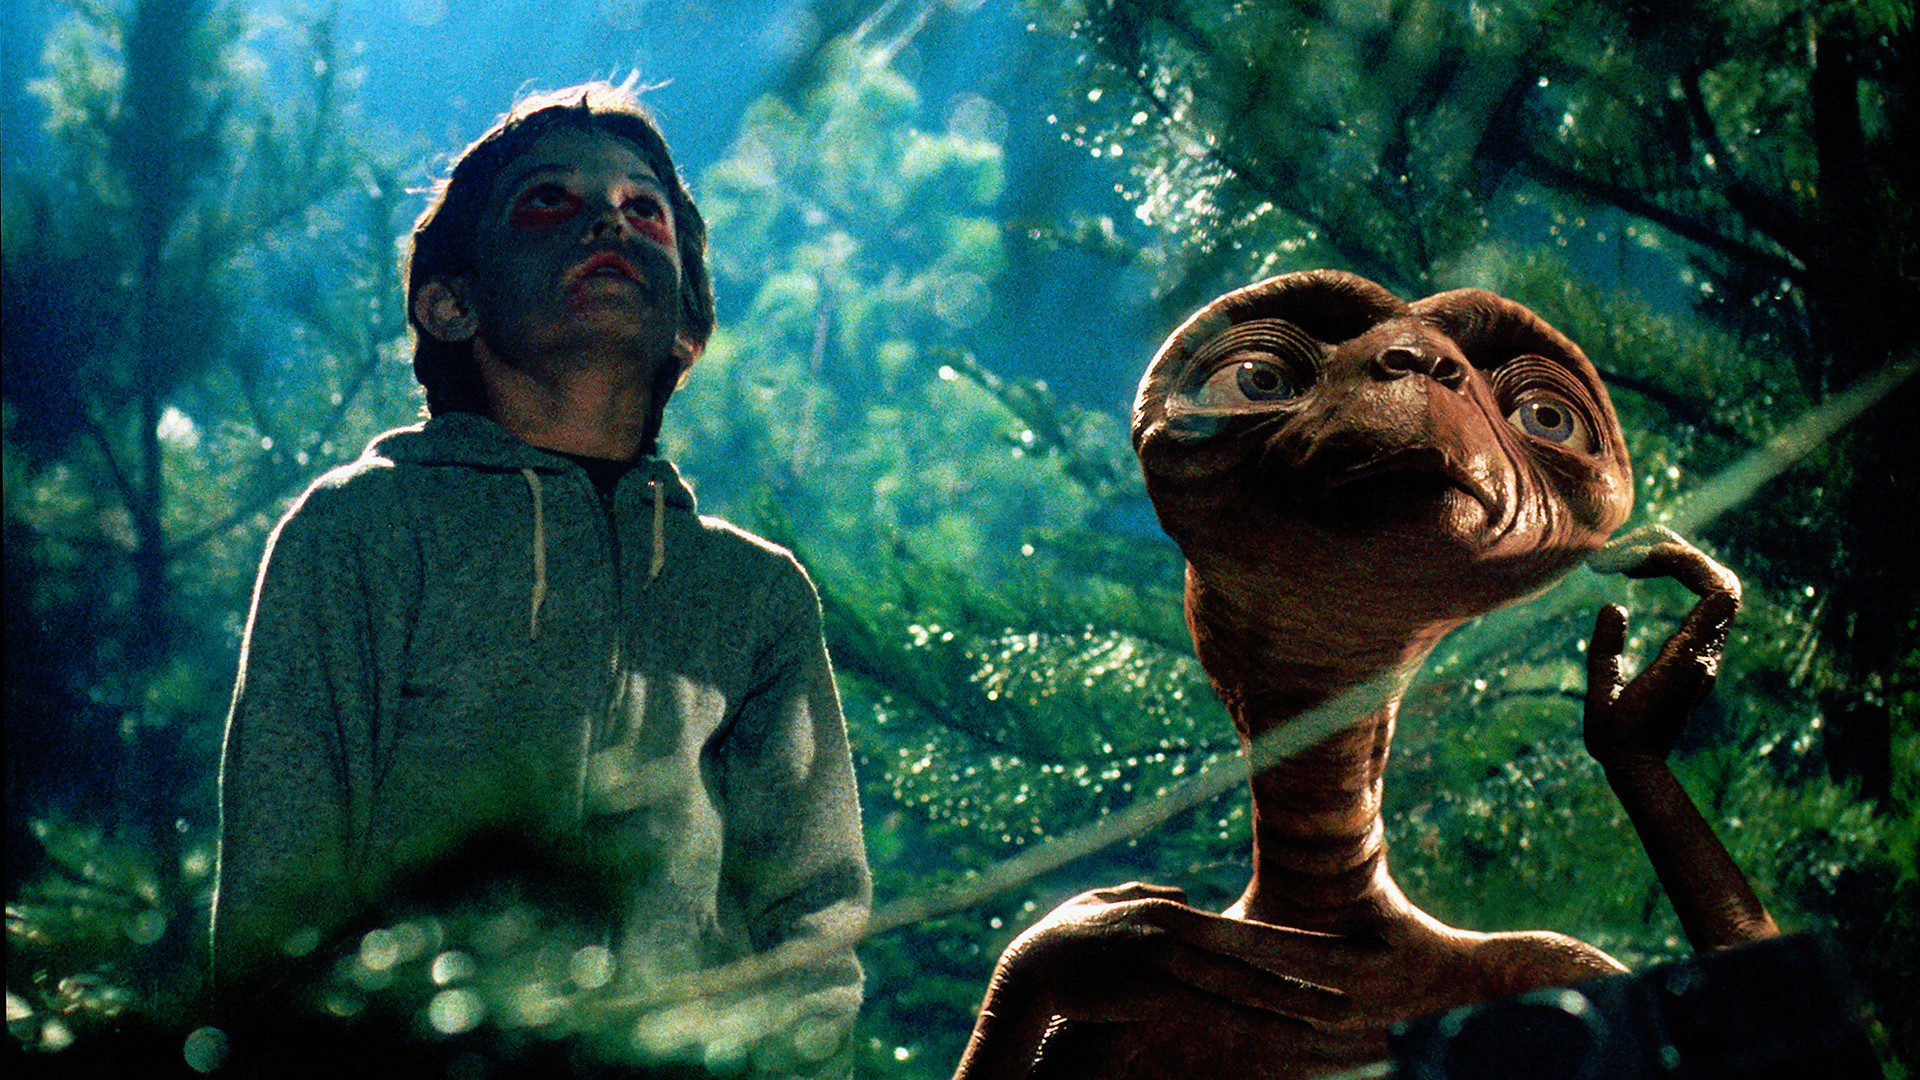 E.T. The Extra-Terrestrial | Highest Grossing Film 1982 | Popcorn Banter